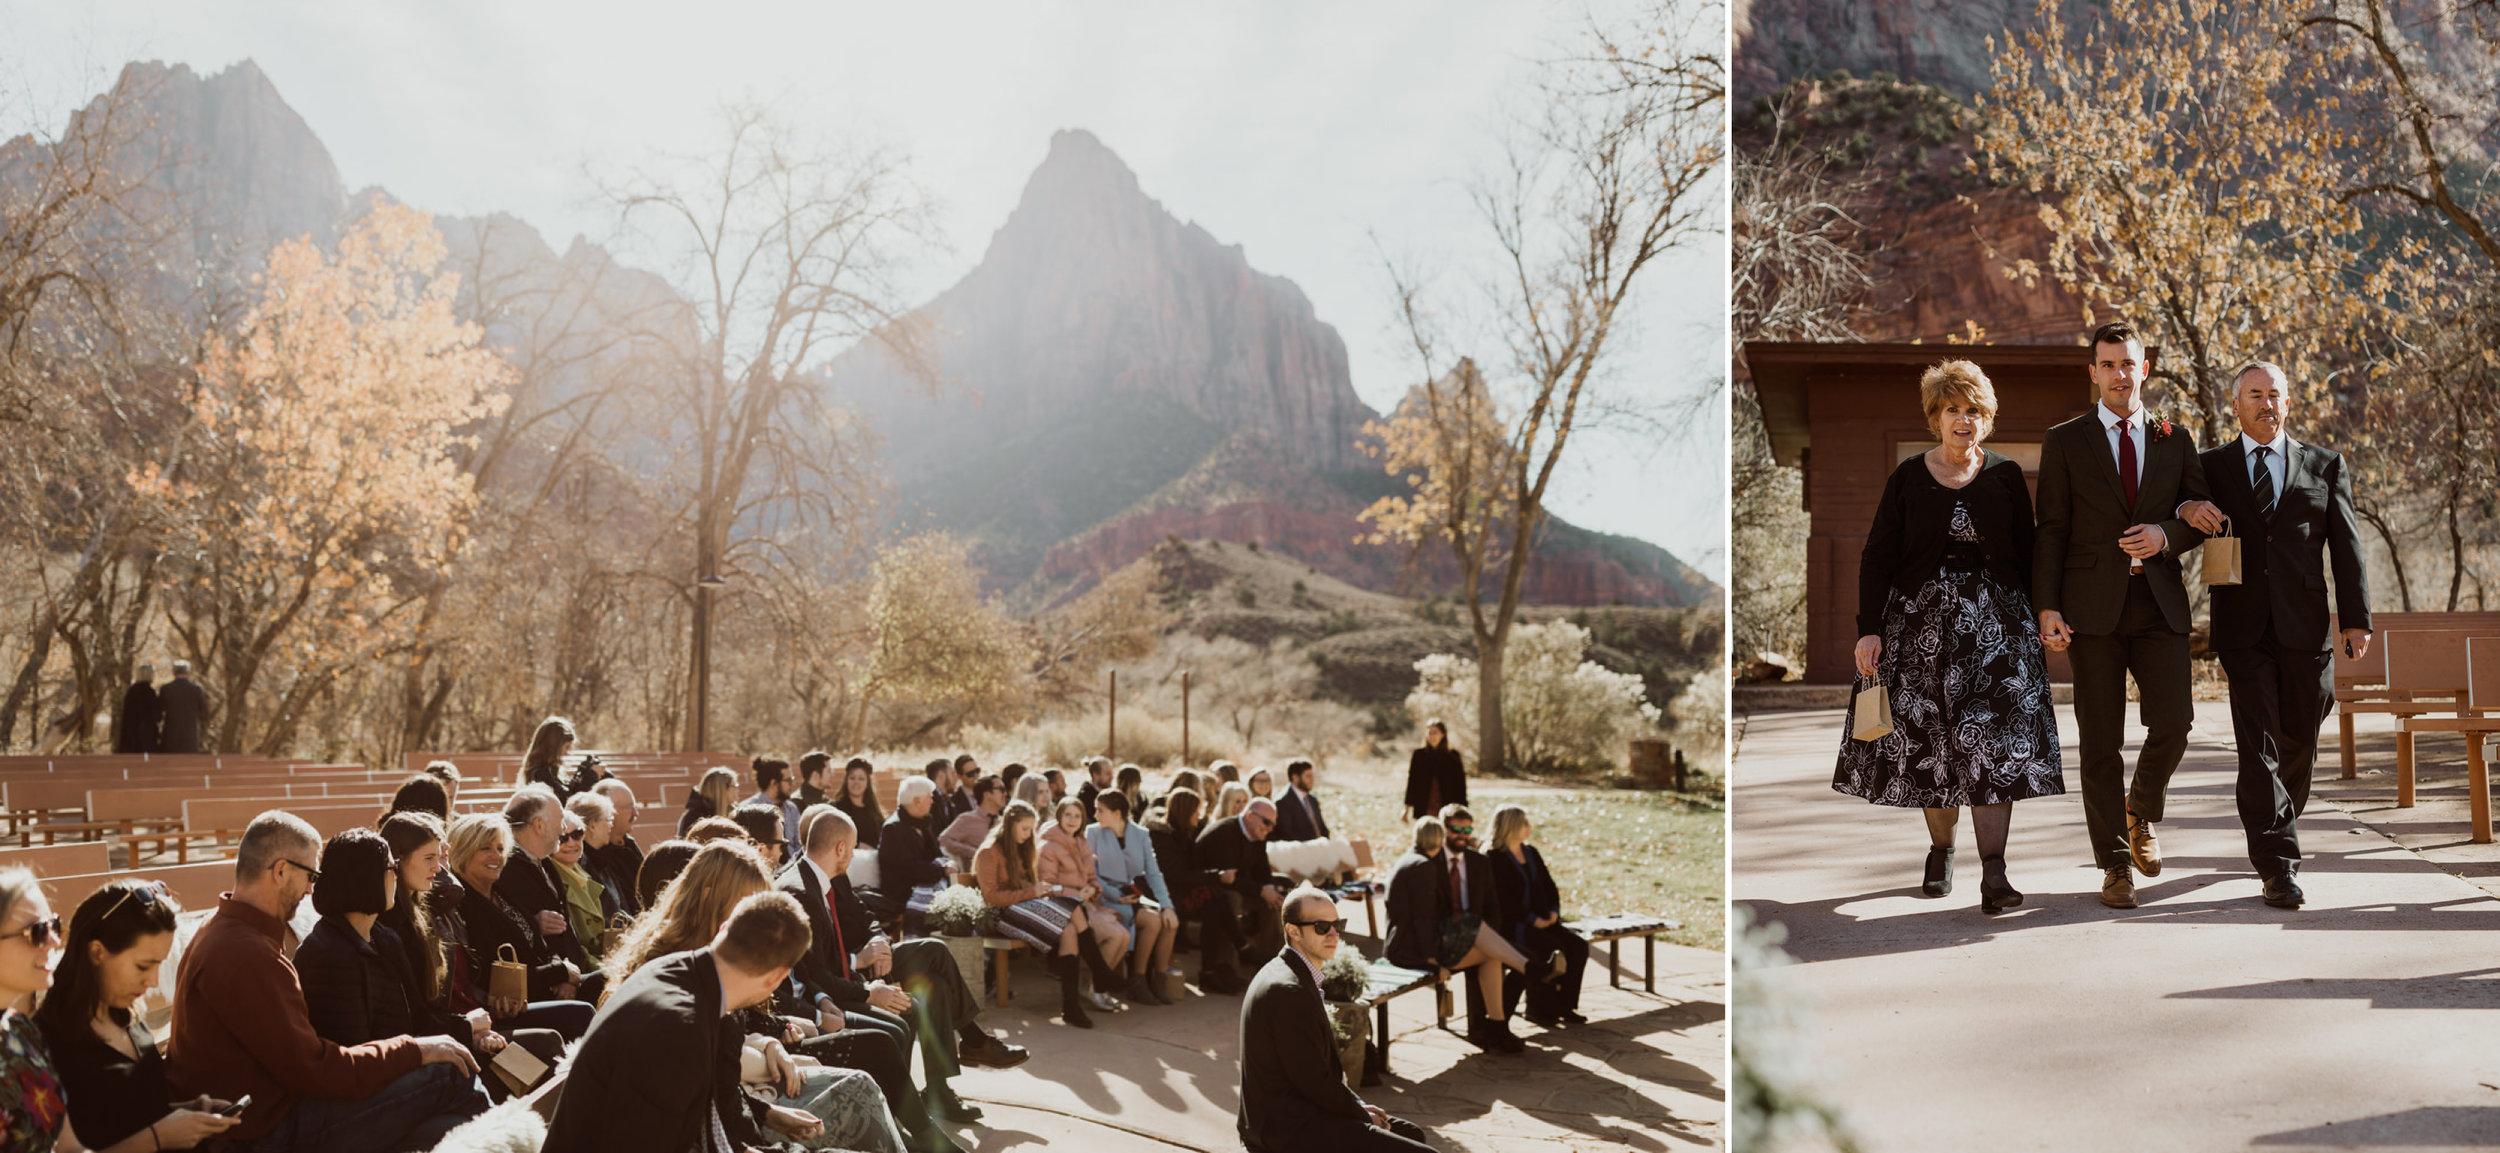 zion-national-park-wedding-160.jpg